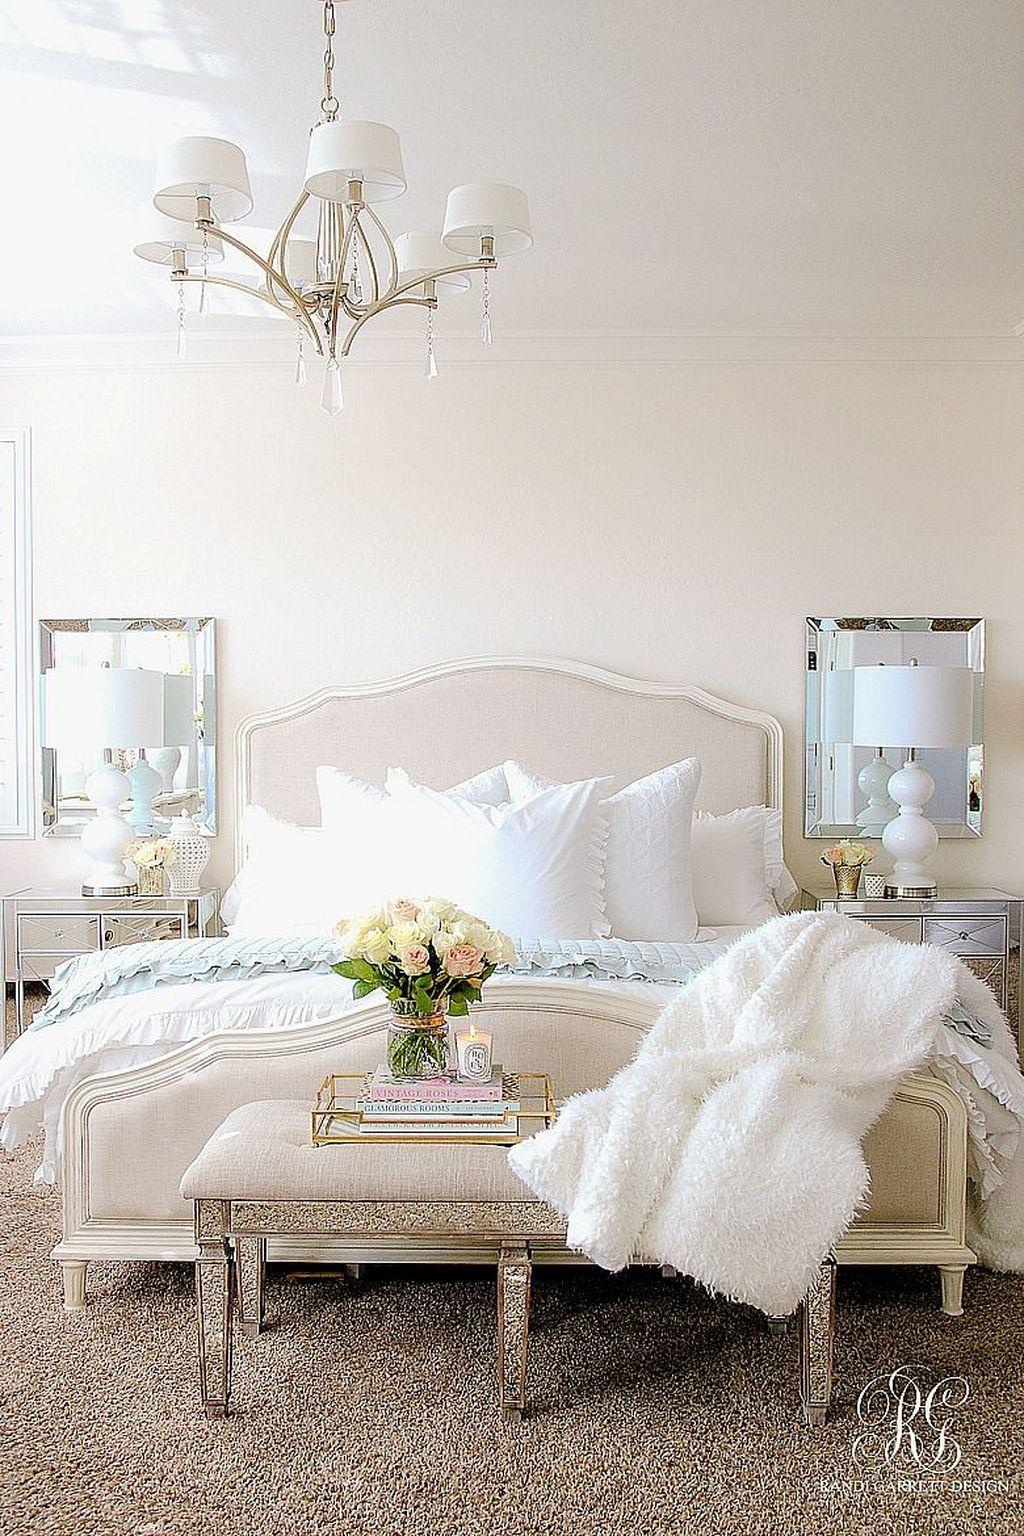 Elegant Romantic Bedrooms: 53 Gorgeous And Romantic Master Bedroom Ideas